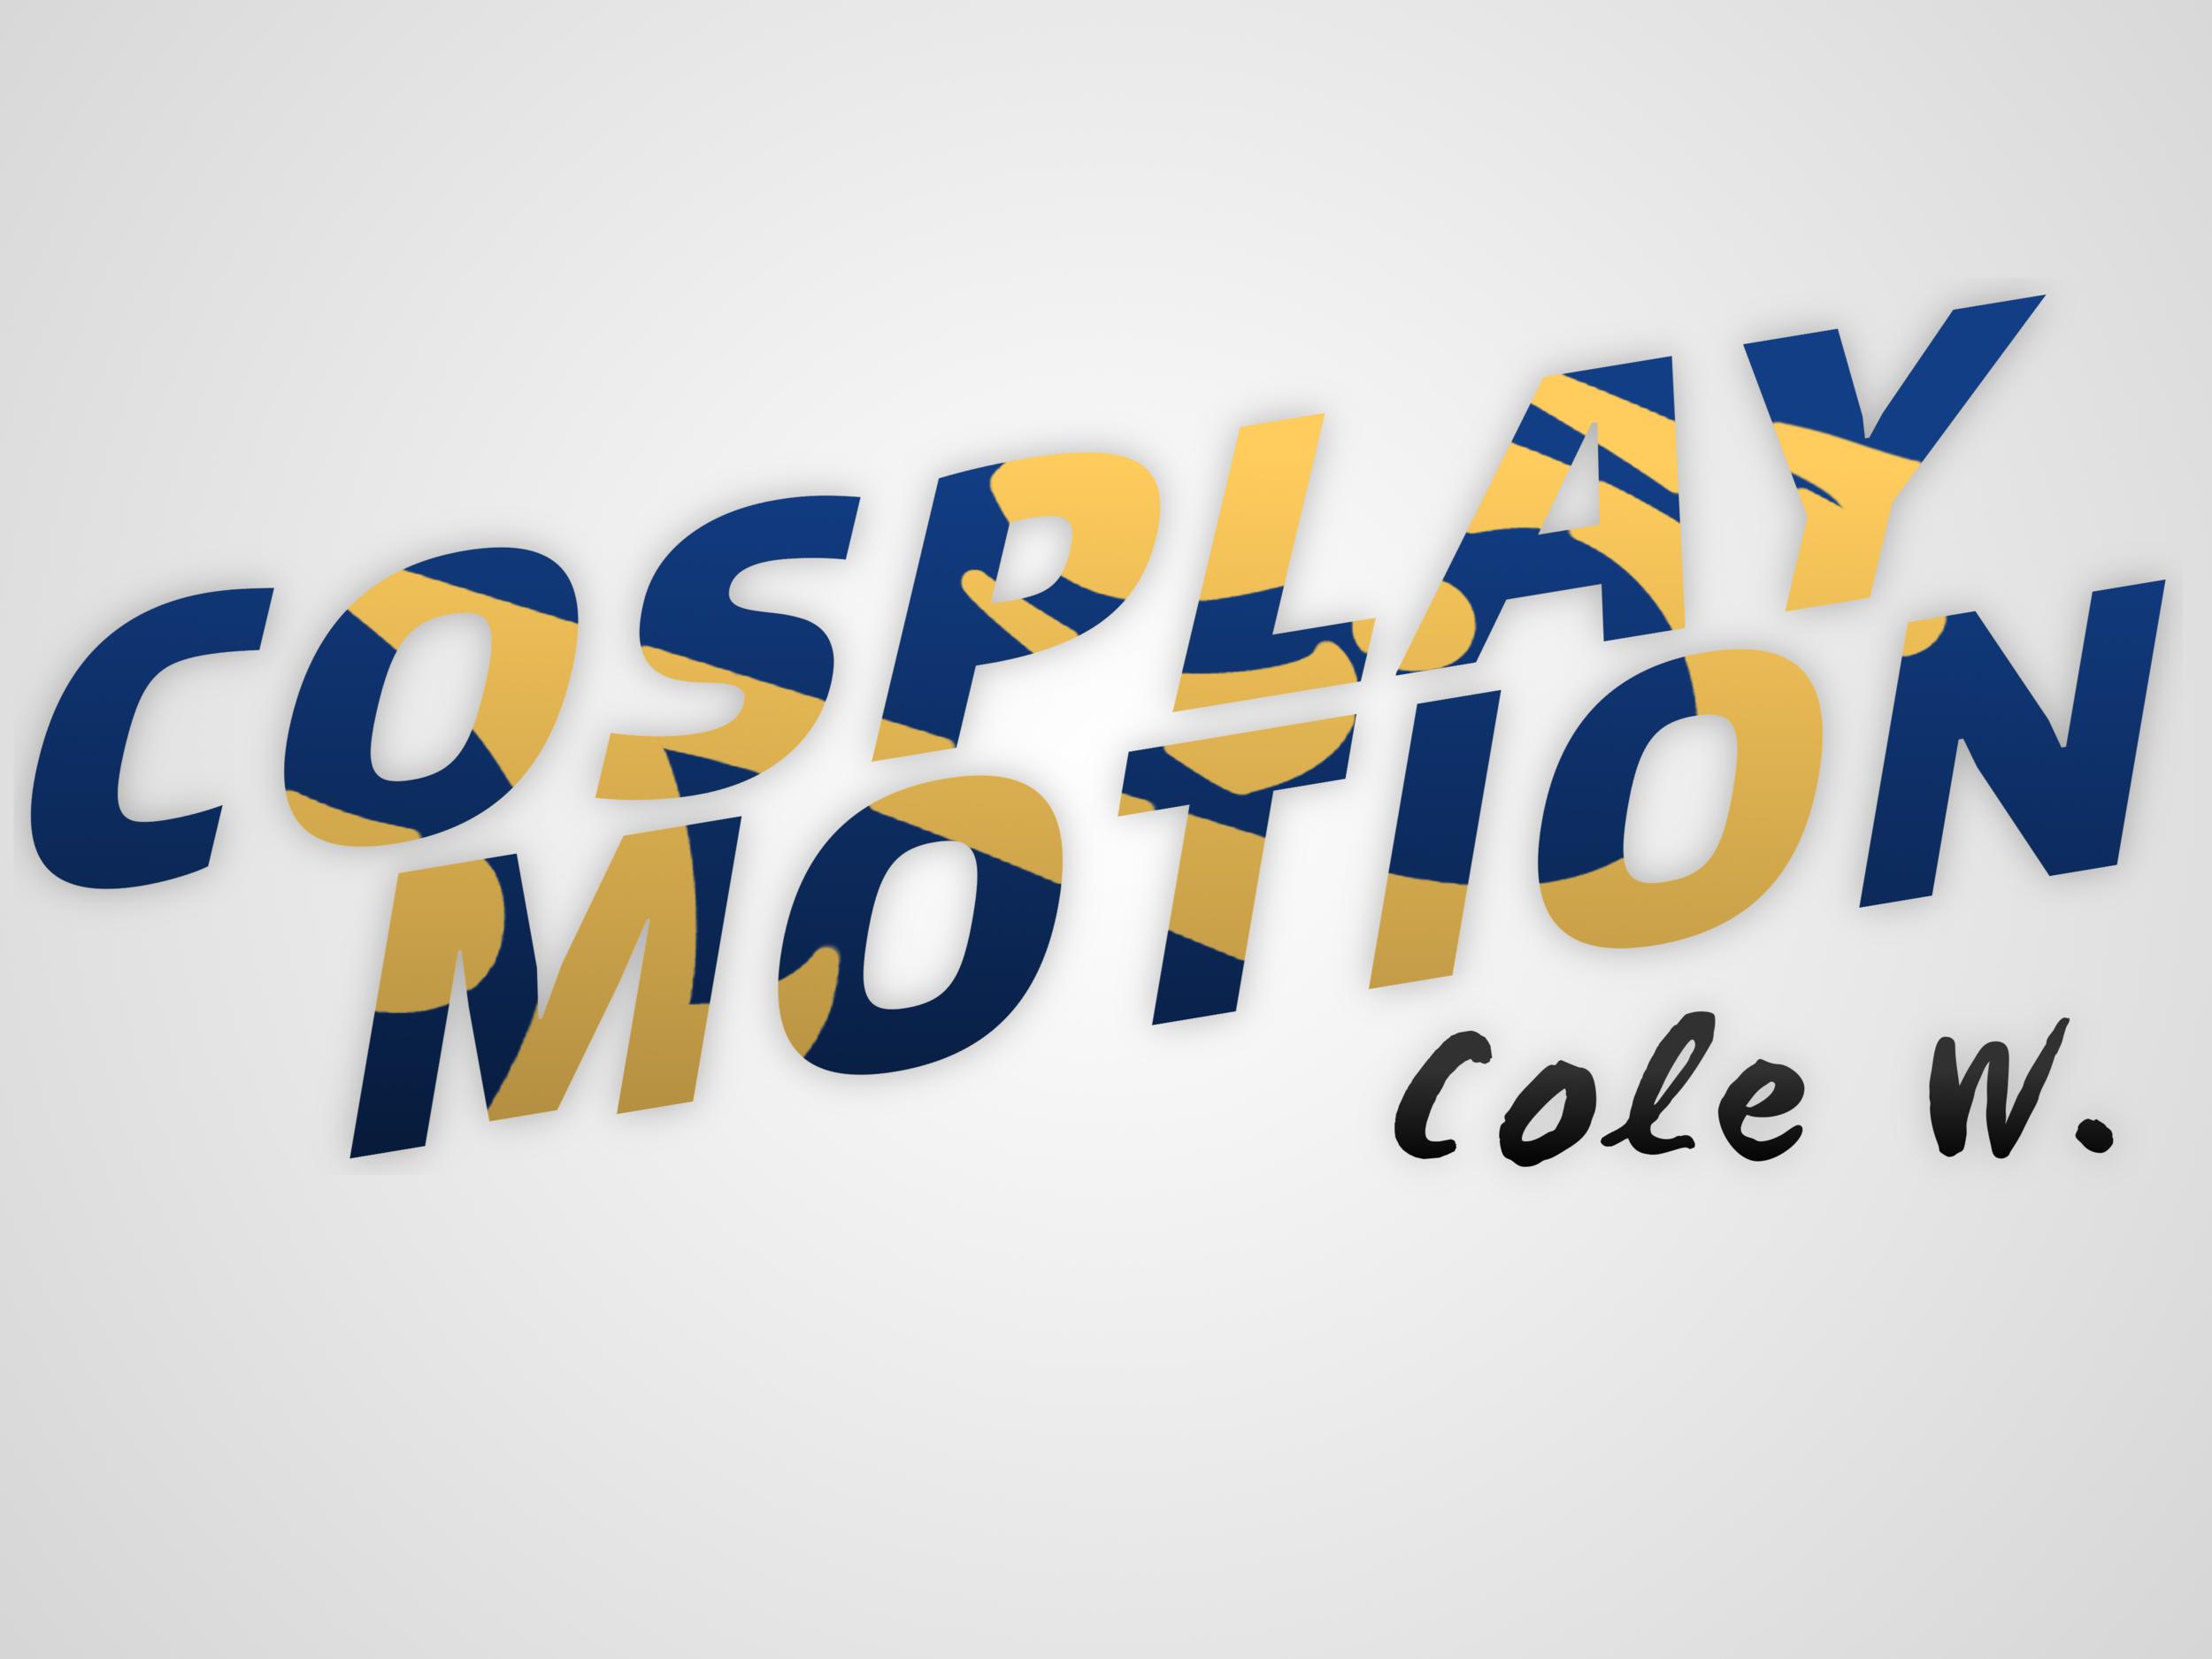 CosplayMotionLogo13_5.png